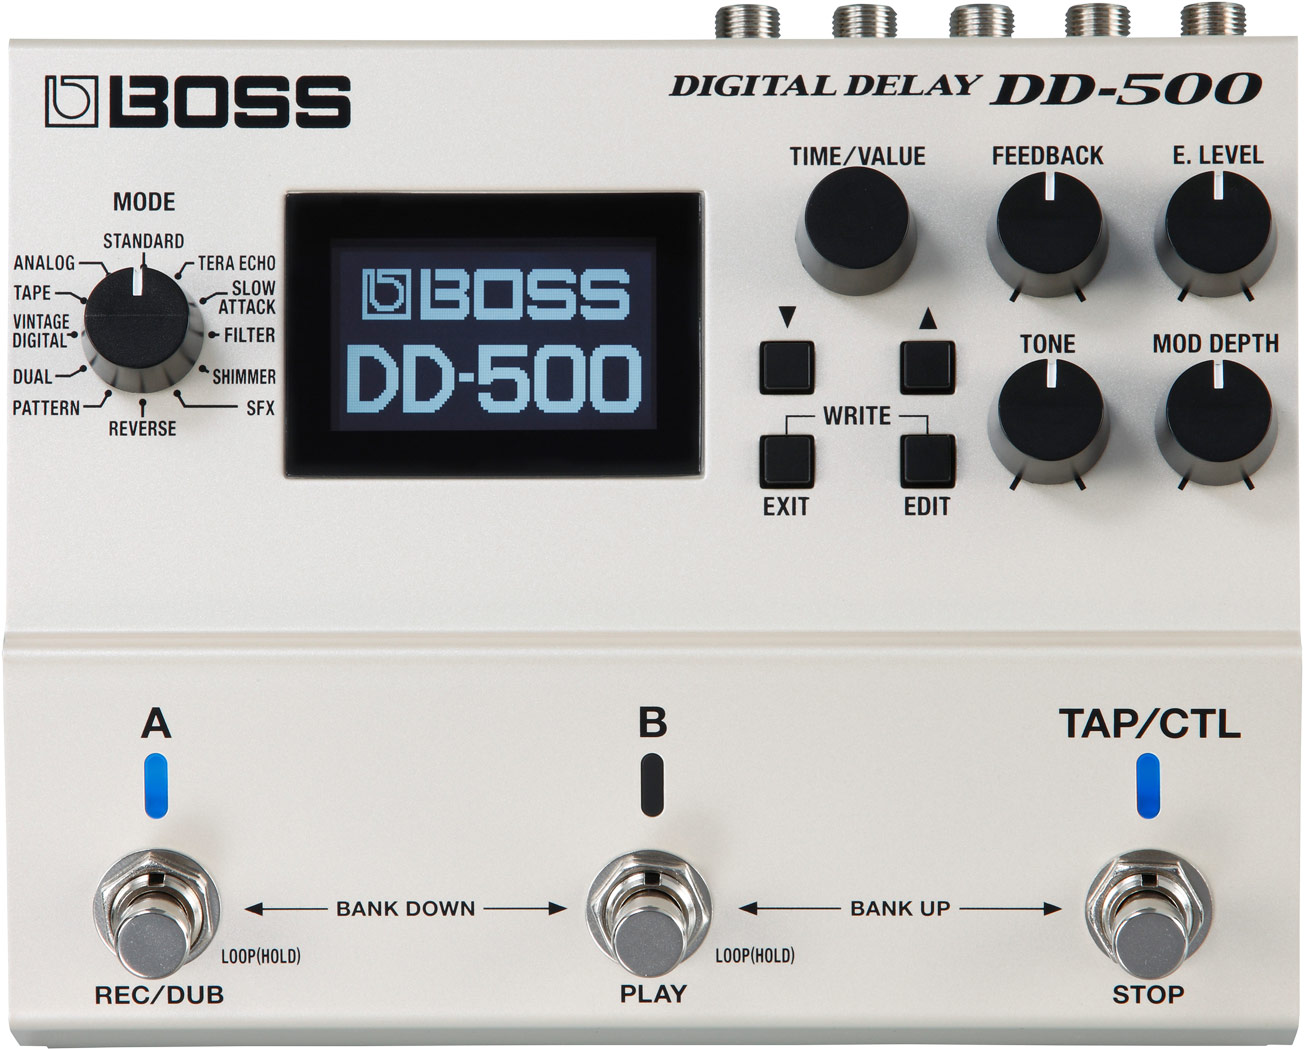 DD-500 / Digital Delay (2015-) 画像1